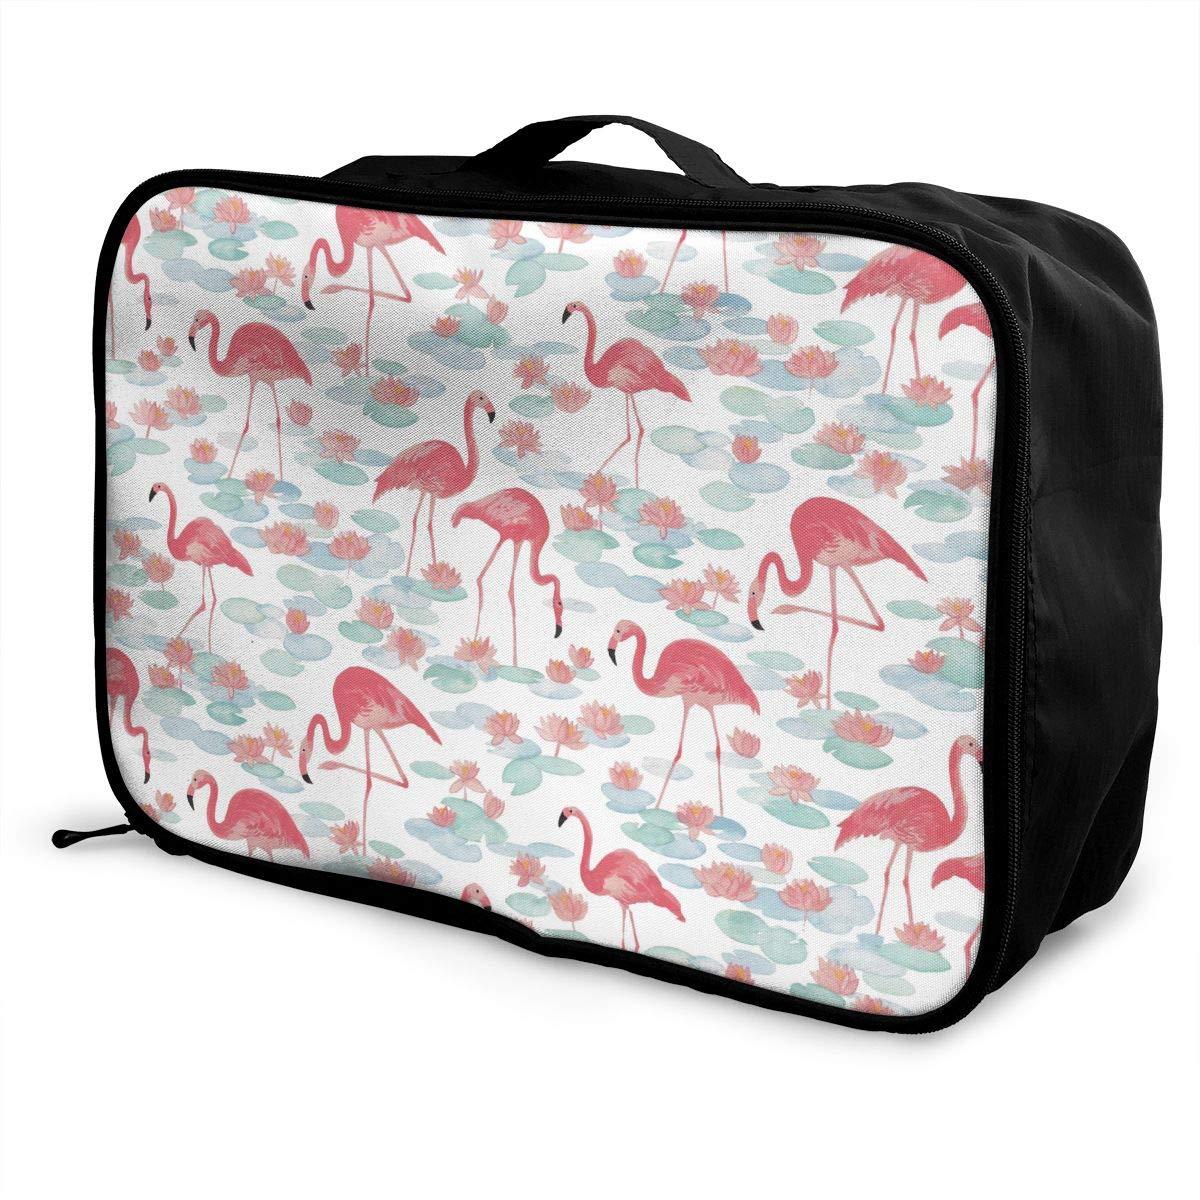 YueLJB Vintage Flamingo Pool Lightweight Large Capacity Portable Luggage Bag Travel Duffel Bag Storage Carry Luggage Duffle Tote Bag